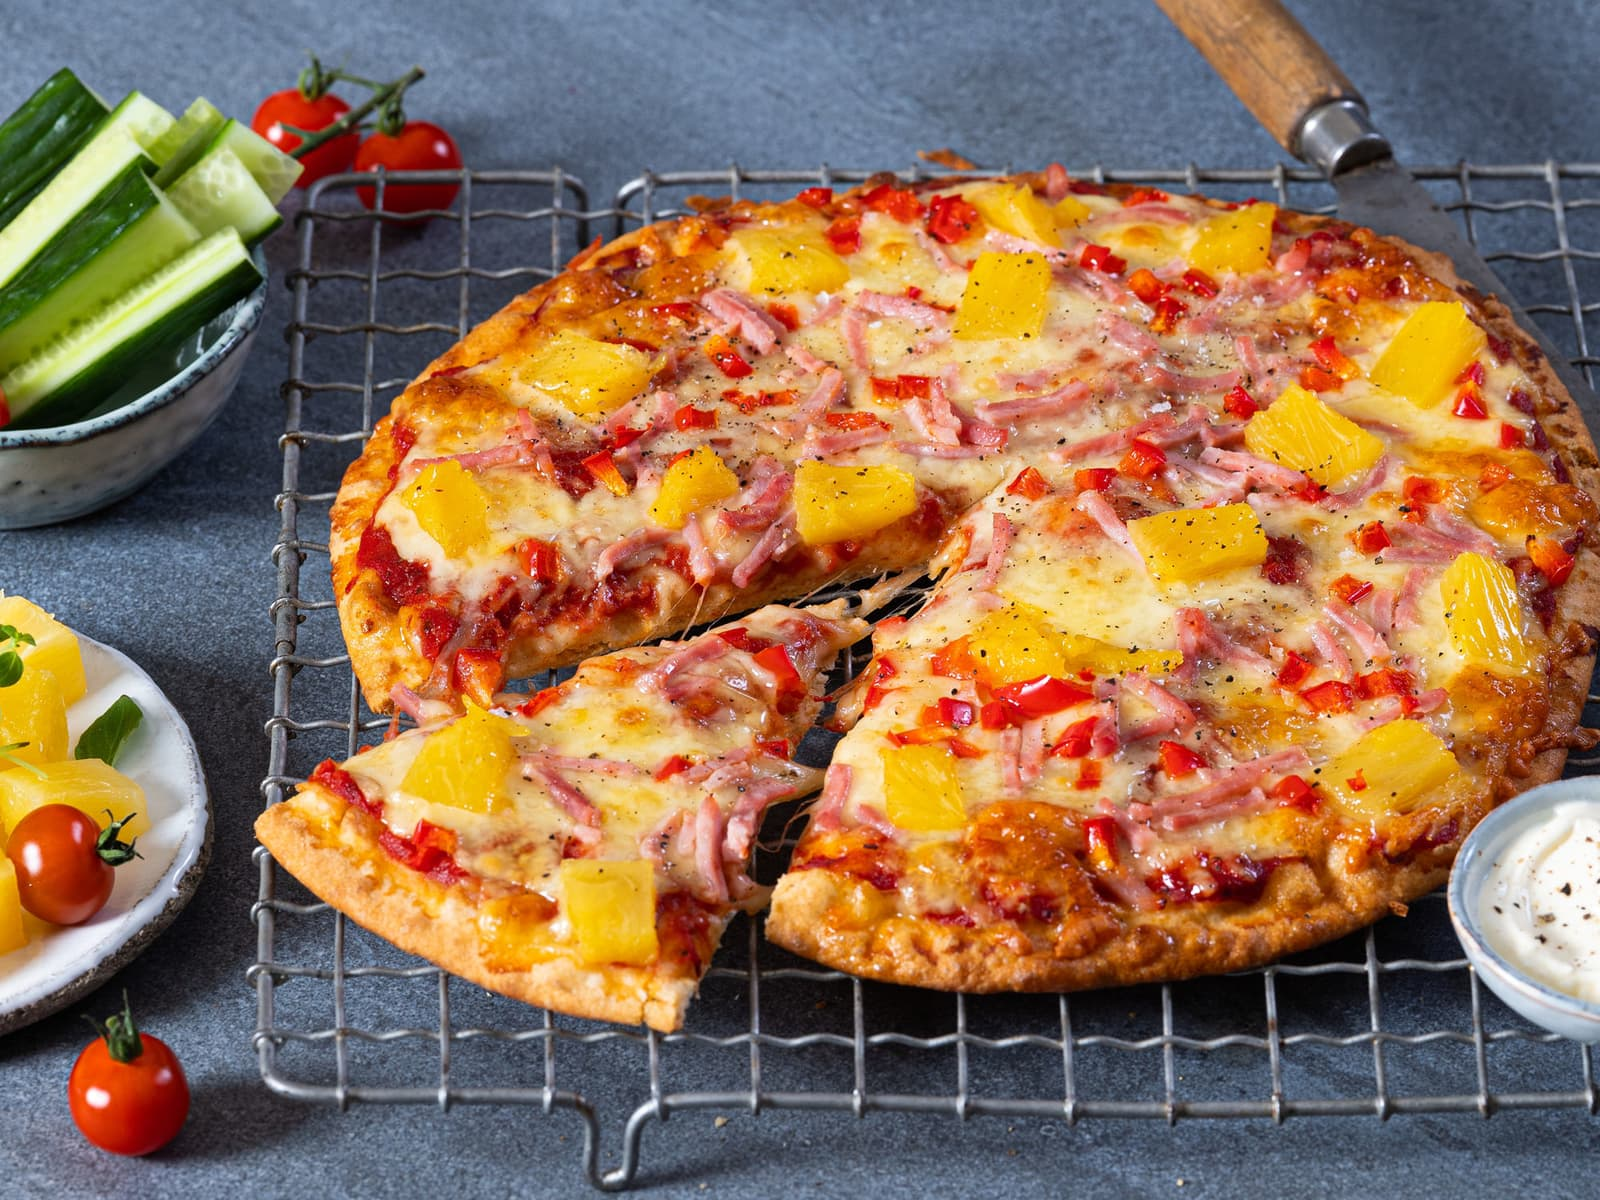 Hawaii pizza med skinke og ananas